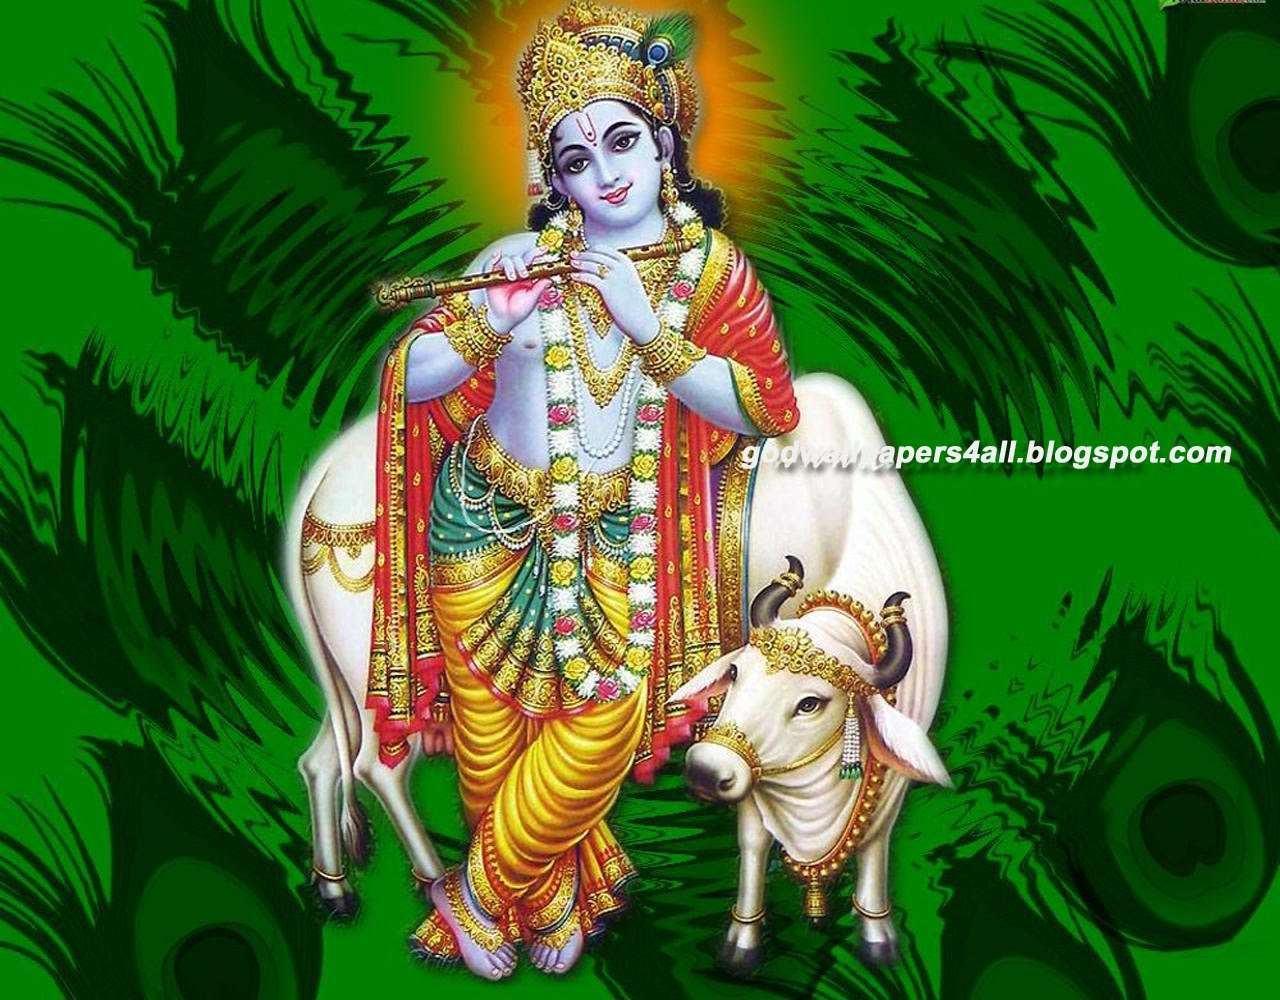 Wallpaper download krishna - Pictures Download God Krishna Wallpaper Lord Krishna 4 Car Pictures